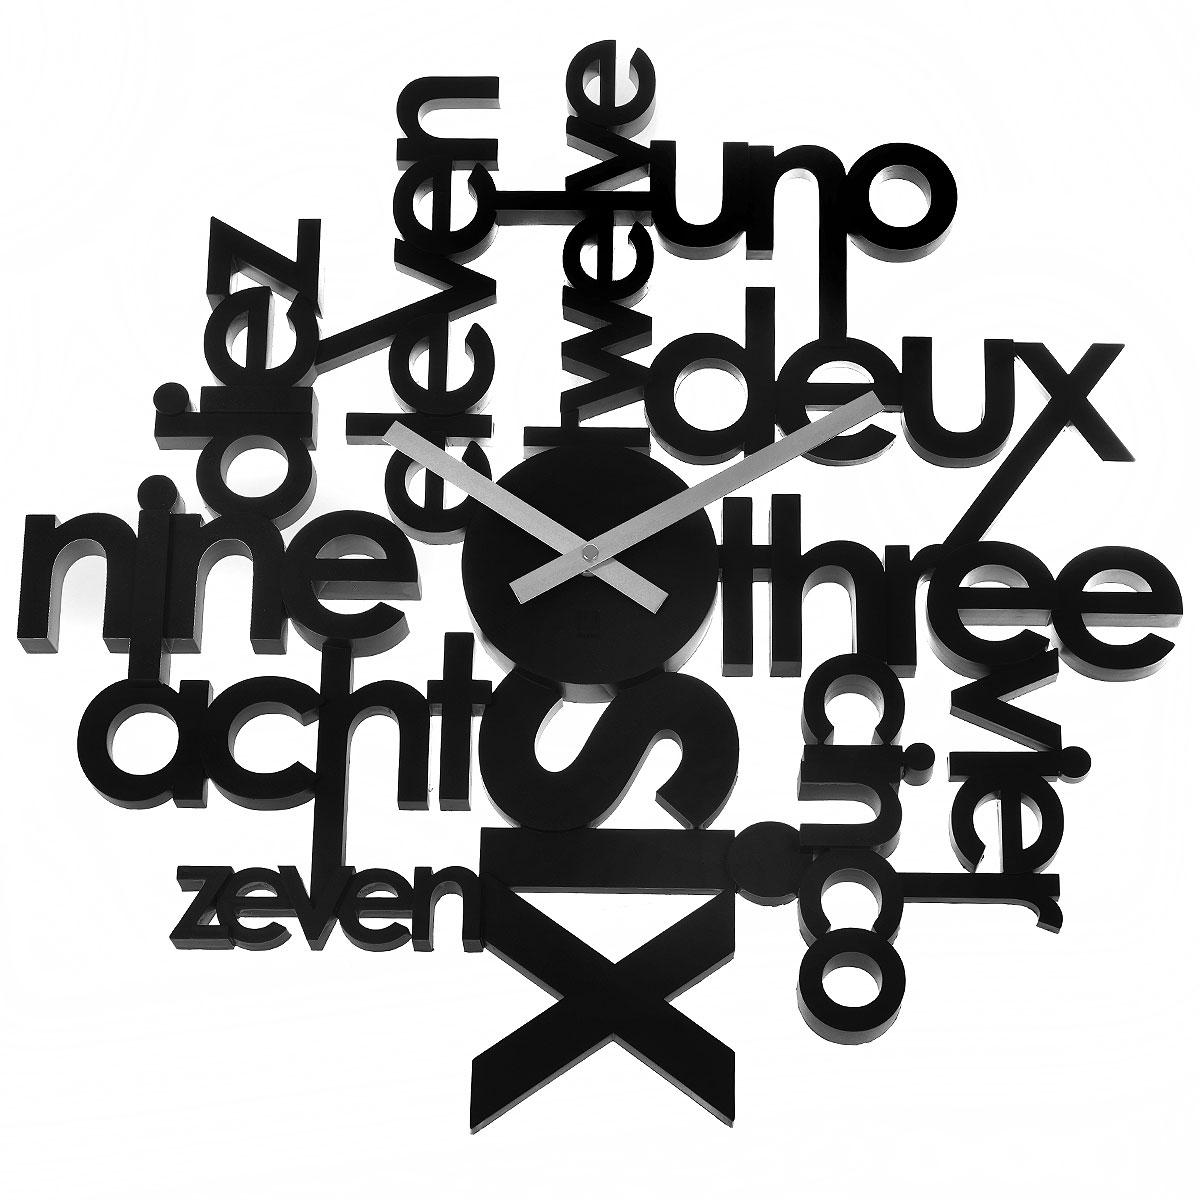 Часы настенные Lingua, цвет: черный. 118990-040 часы настенные lingua цвет черный 118990 040